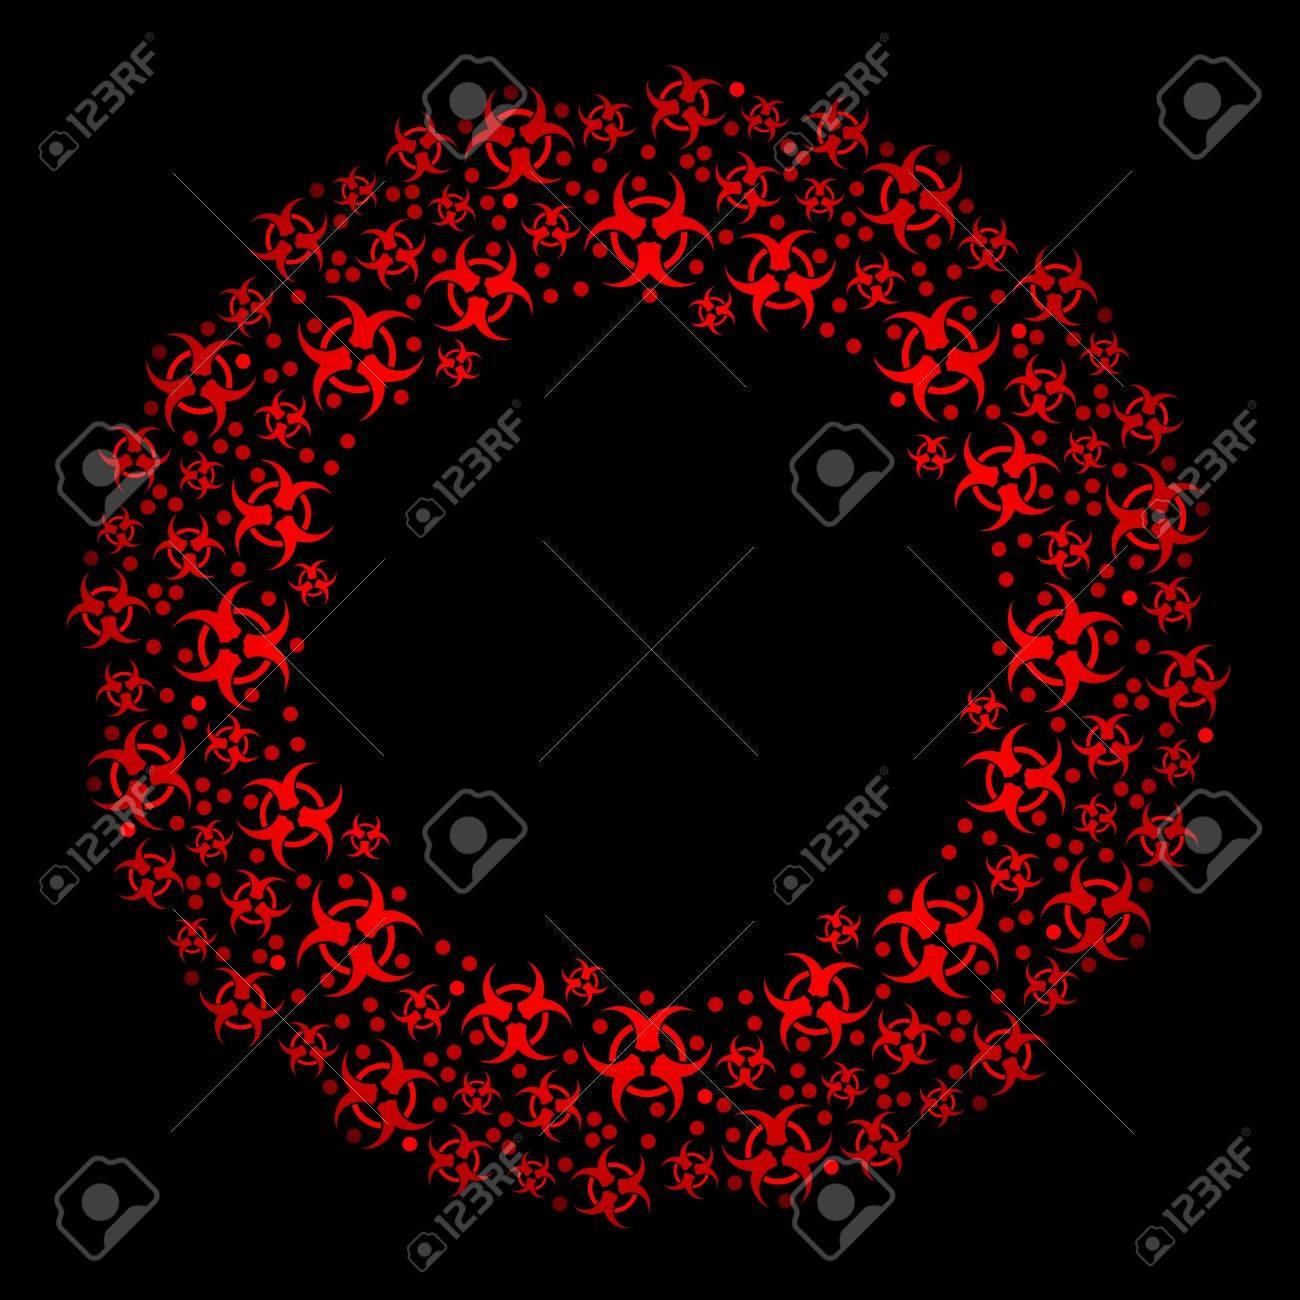 Biohazard wreath Stock Vector - 8341697